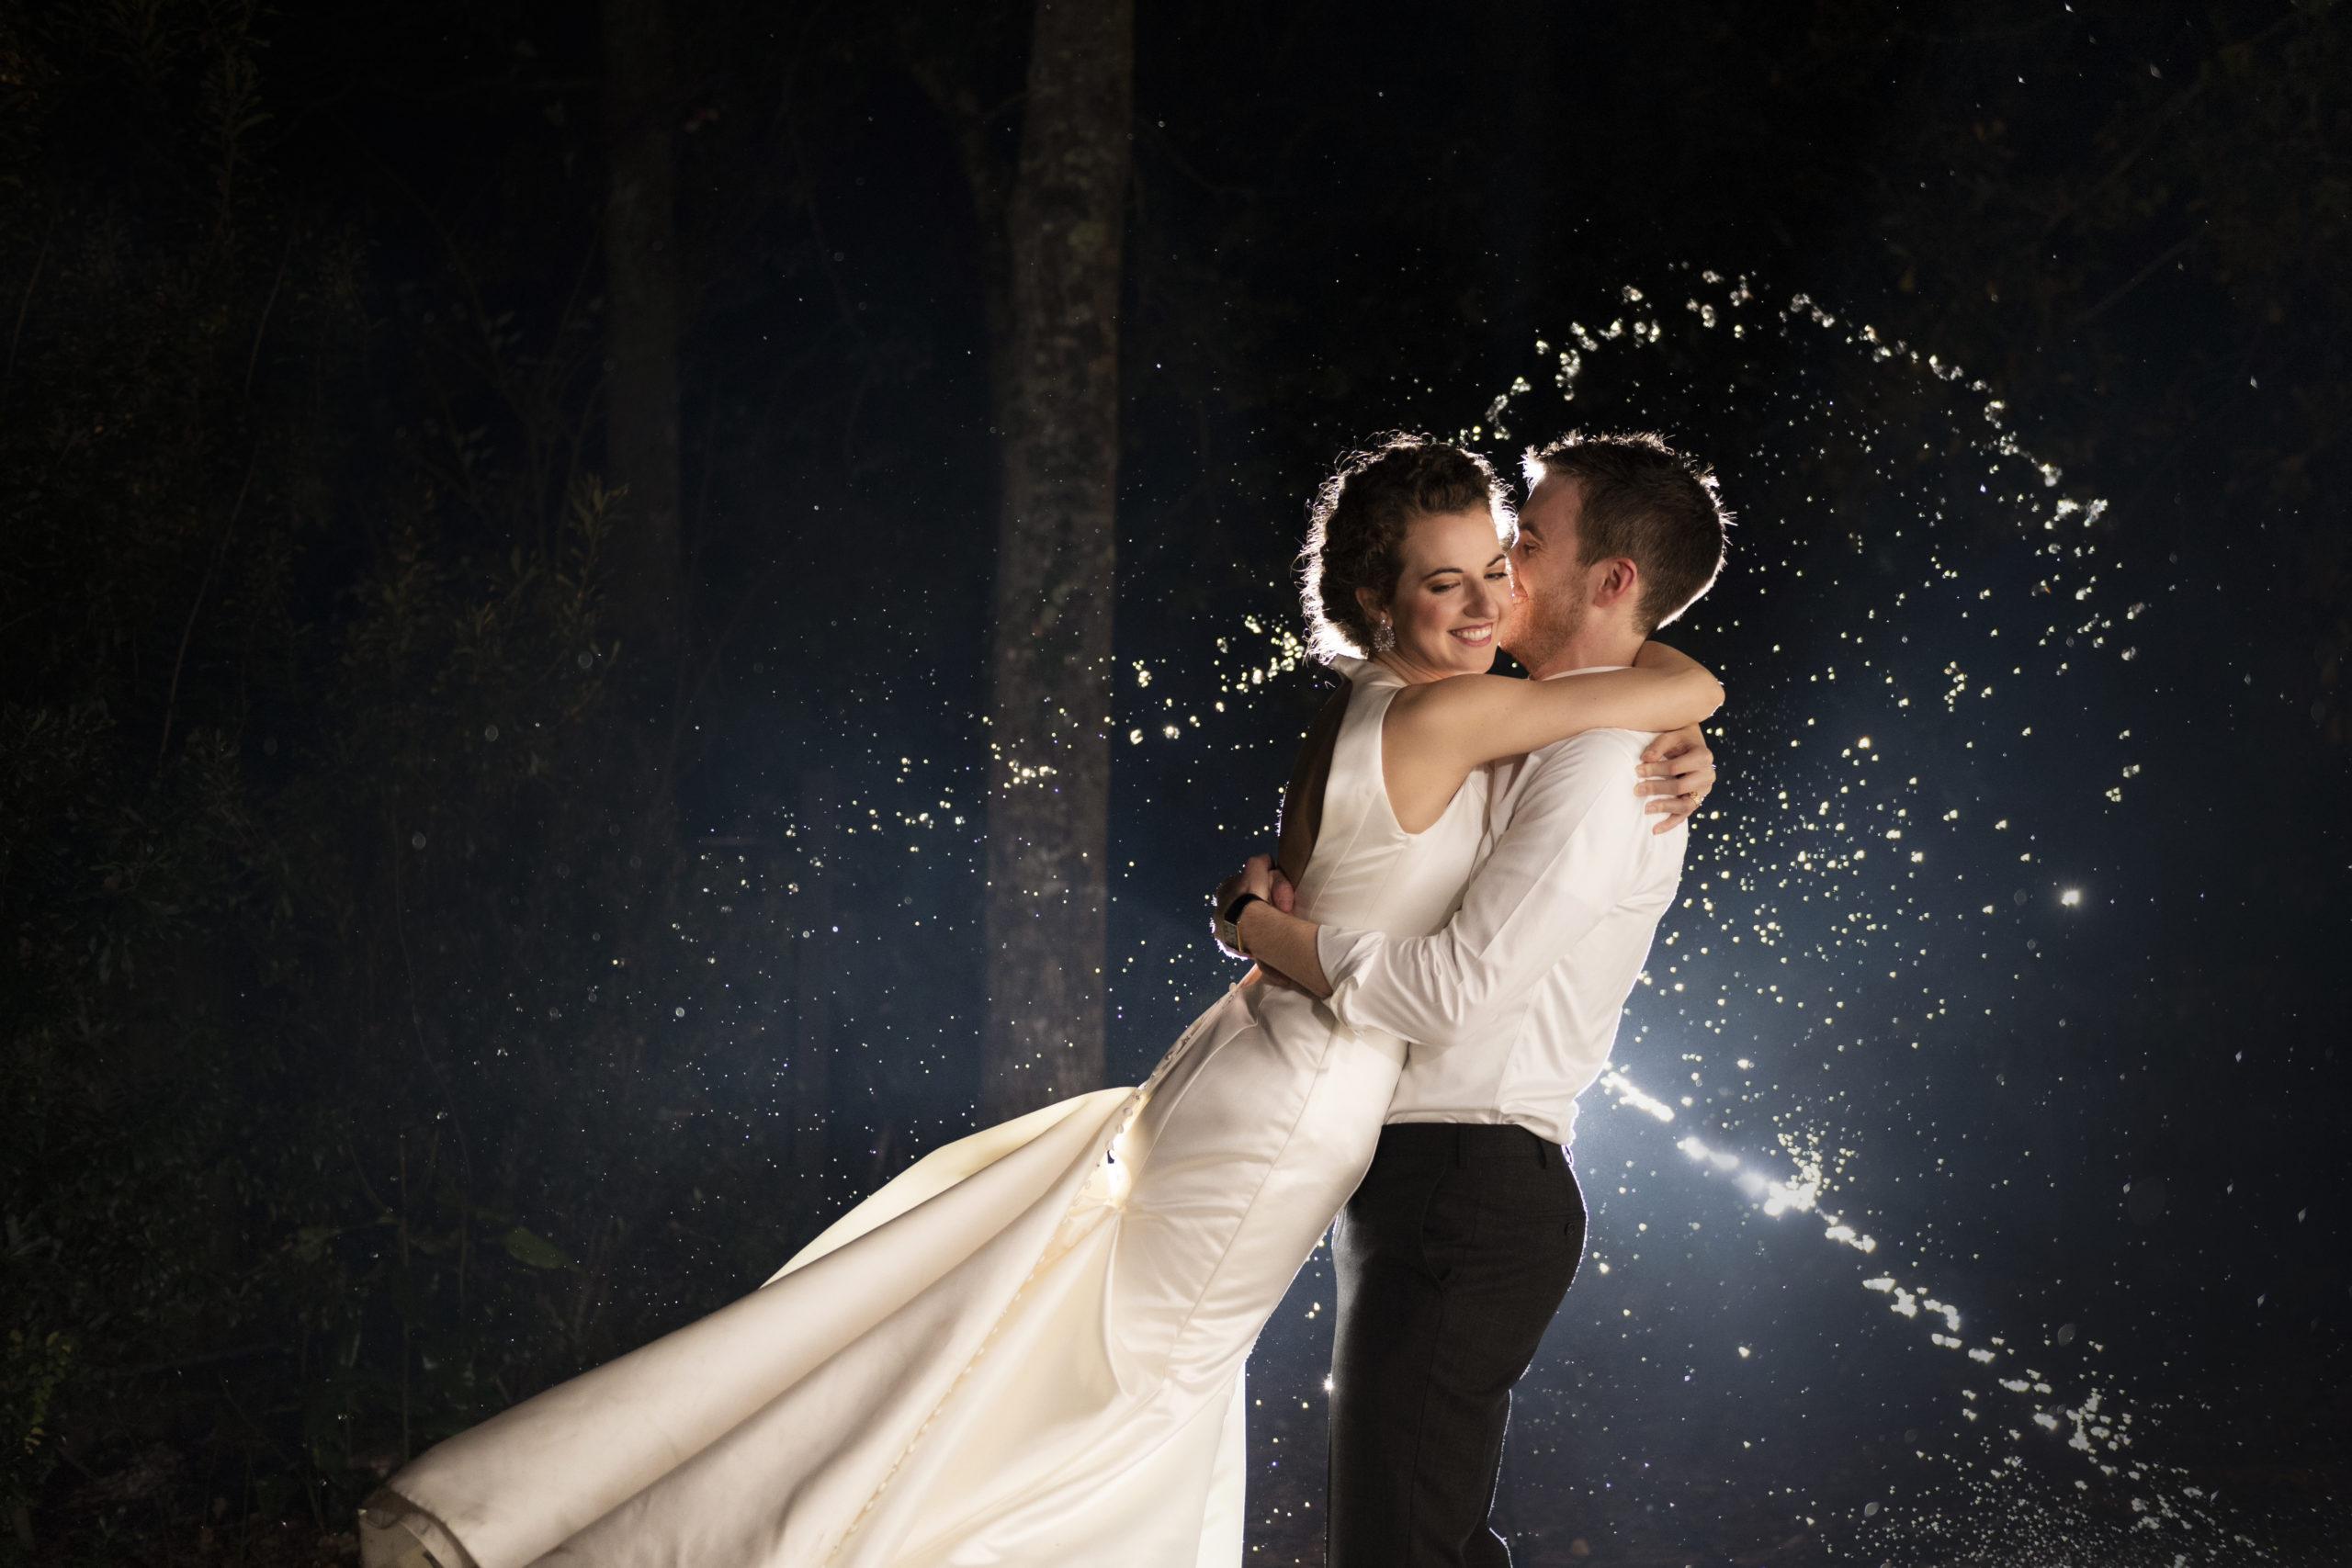 First dance - Aislinn Kate Wedding Photography - Pensacola, Florida